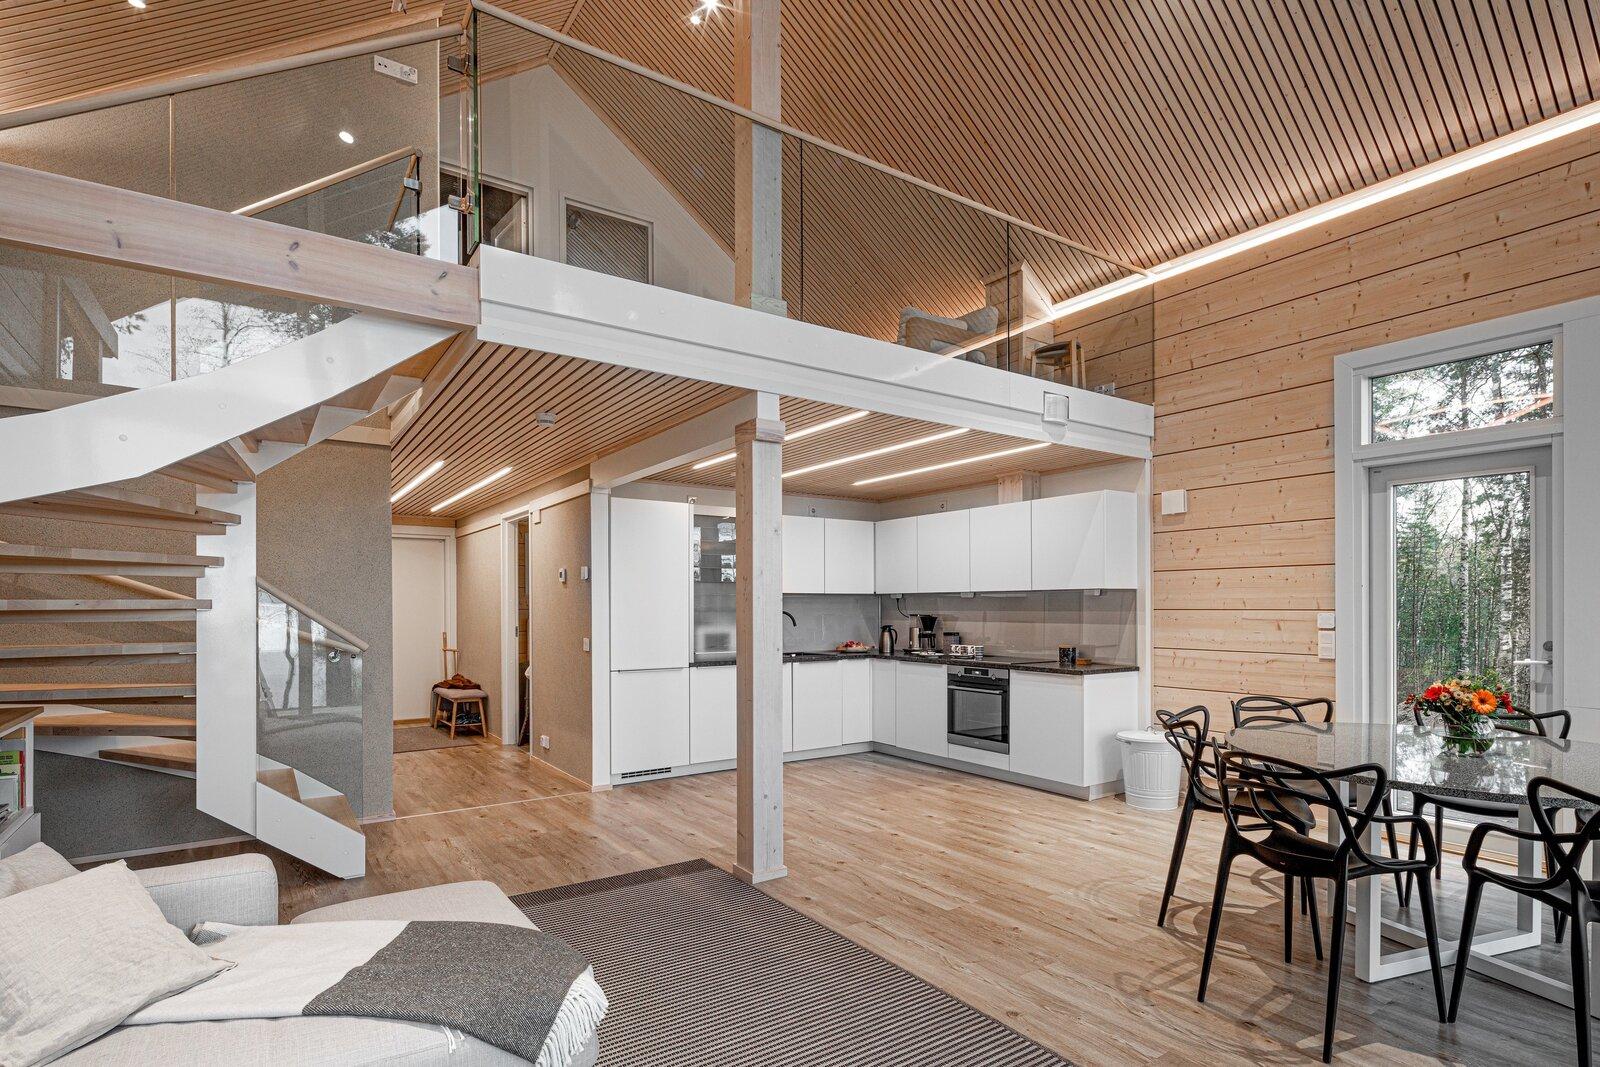 Iniö Log Cabin Kit Home living area